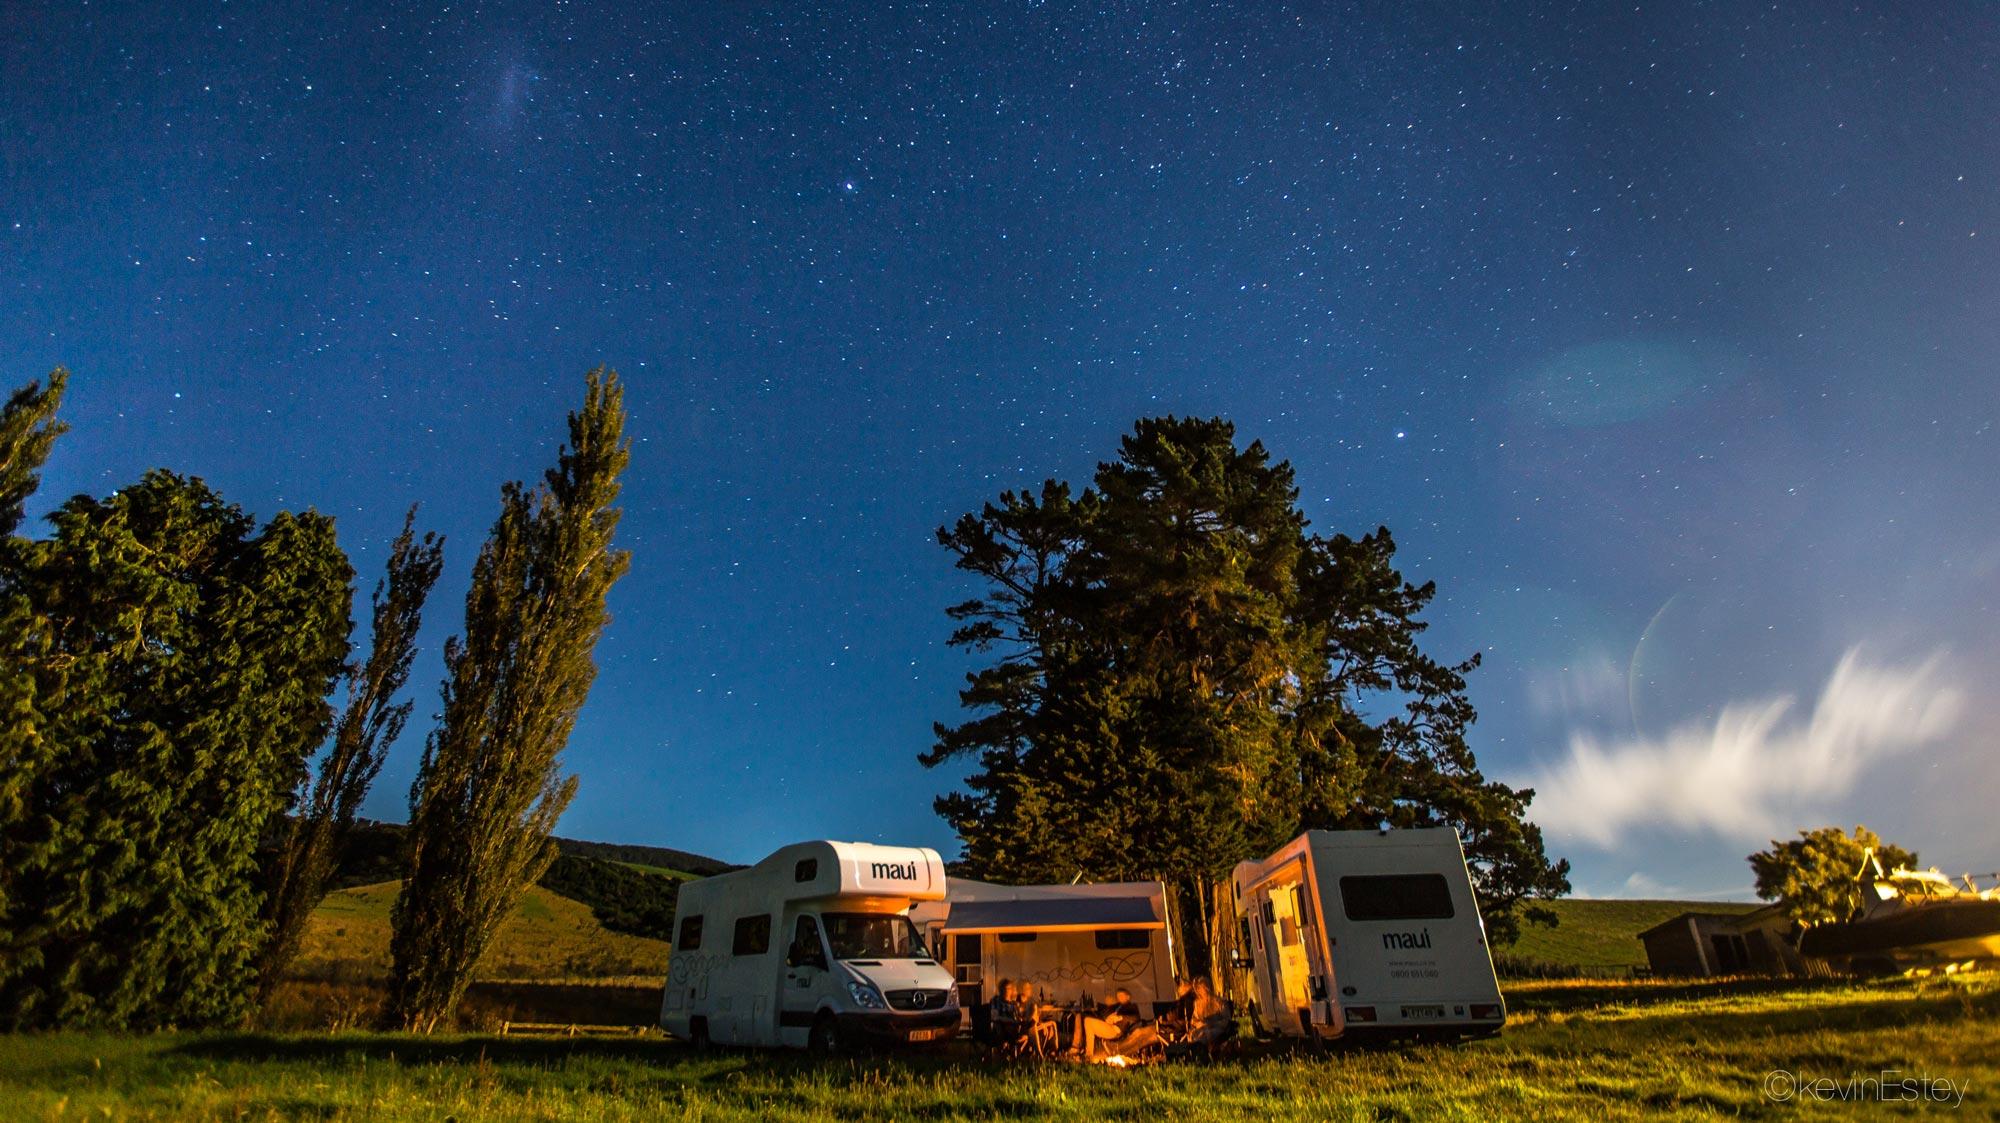 camperNight_FrontPage.jpg